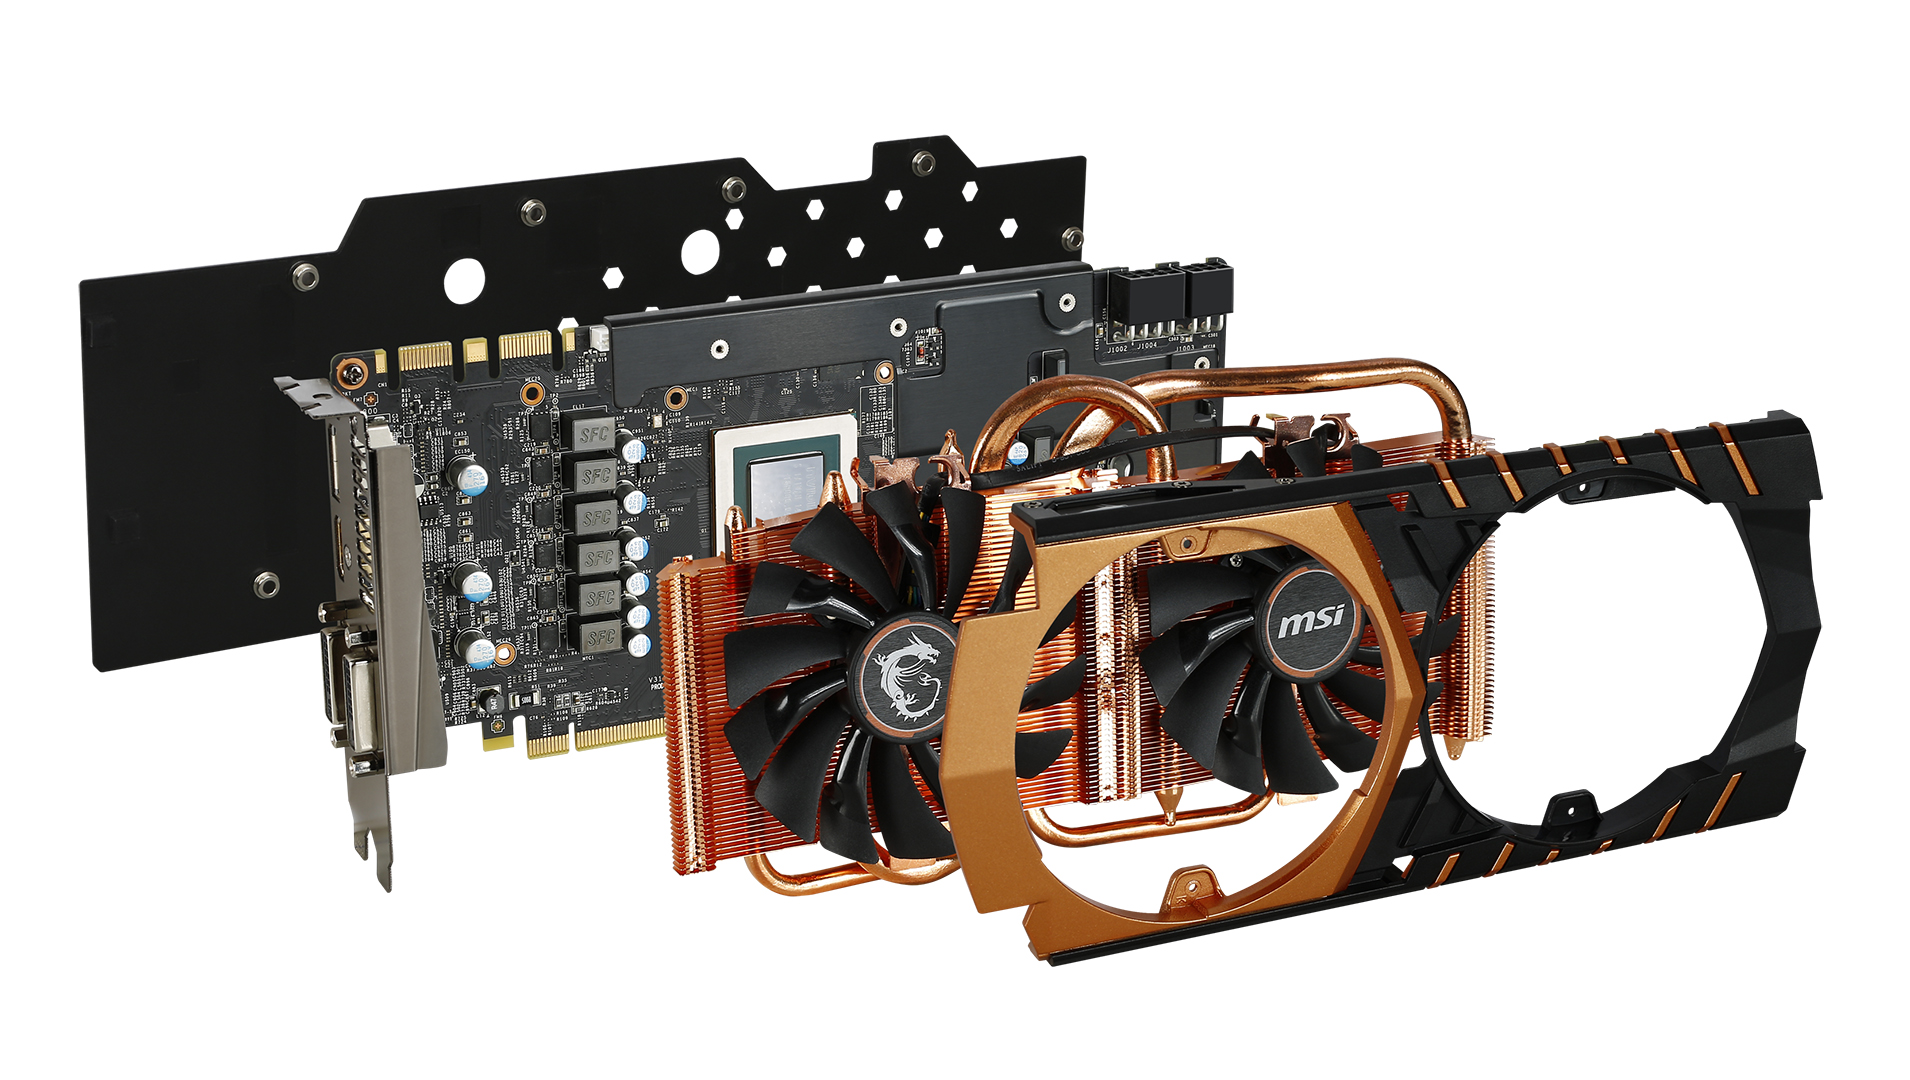 MSI Announces The GTX 970 Gaming 4G Golden Edition